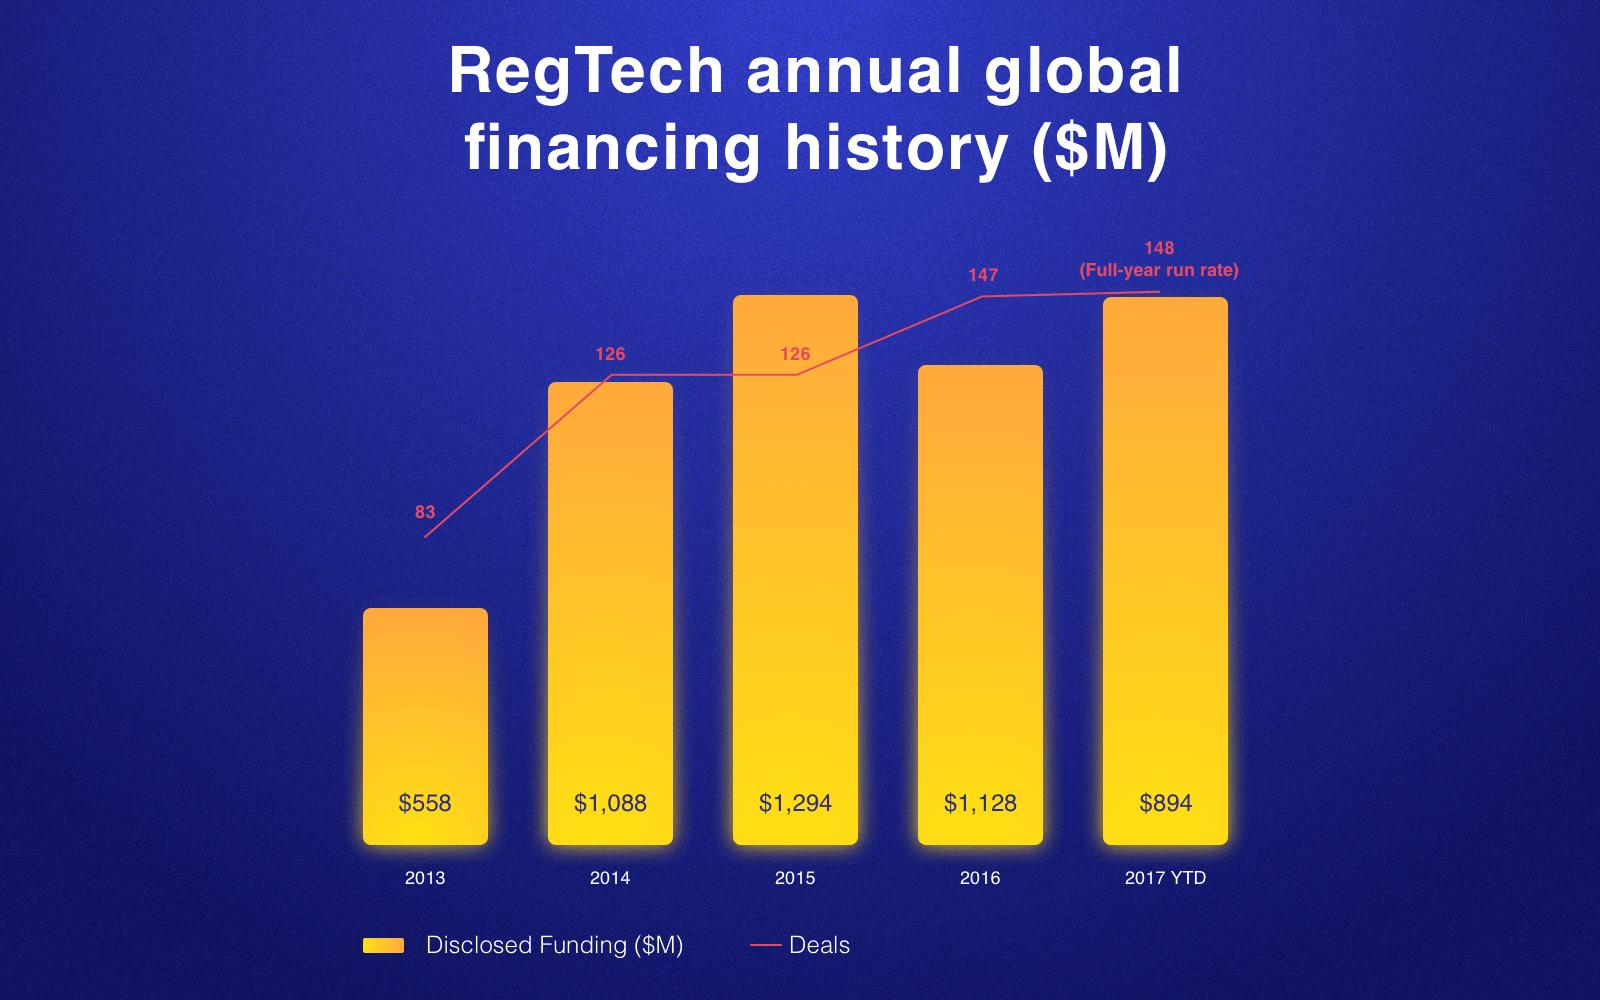 RegTech industry: Statistics